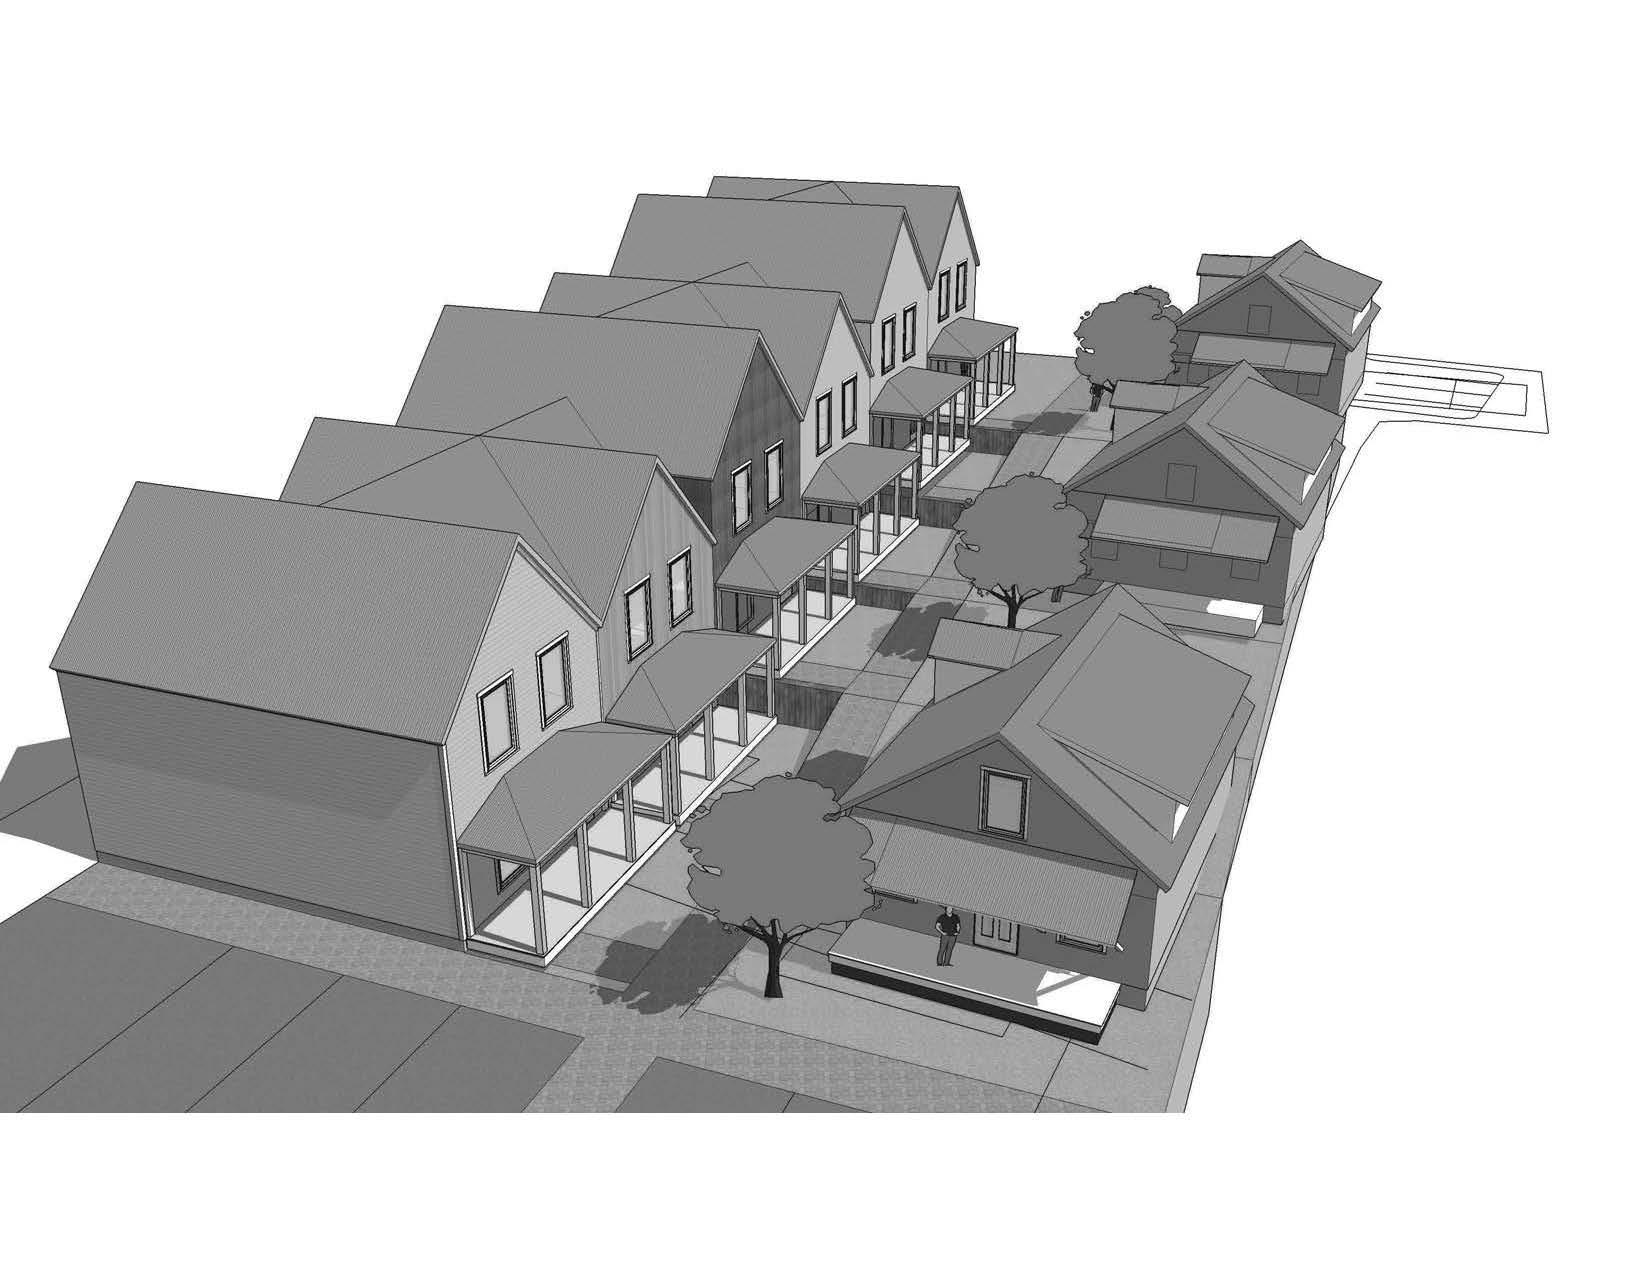 1712 brigham townhouse site rendered 9-1-2017 B&W 1_Page_1.jpg